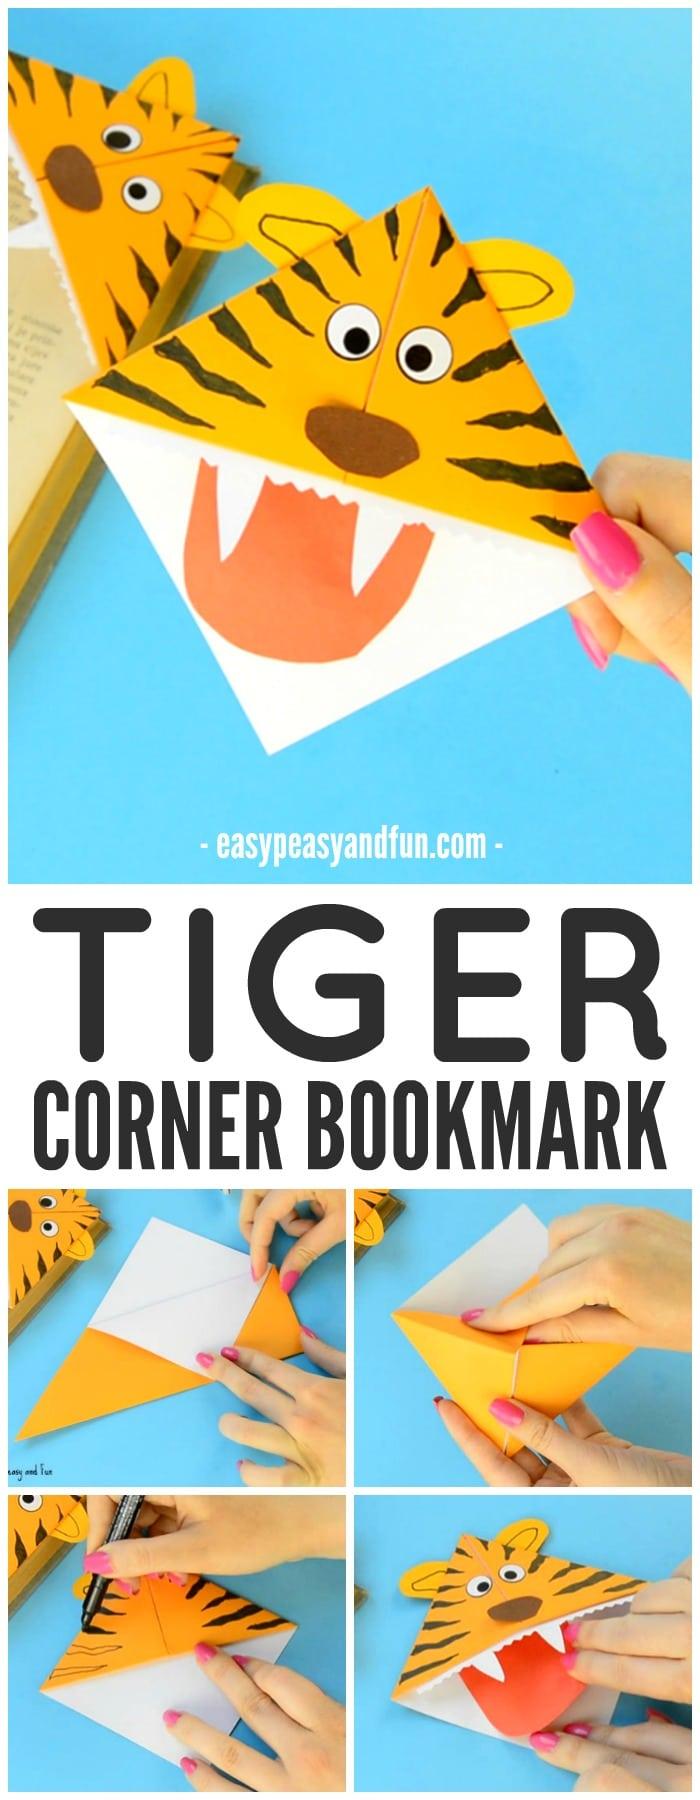 Cute Tiger Corner Bookmarks Craft for Kids